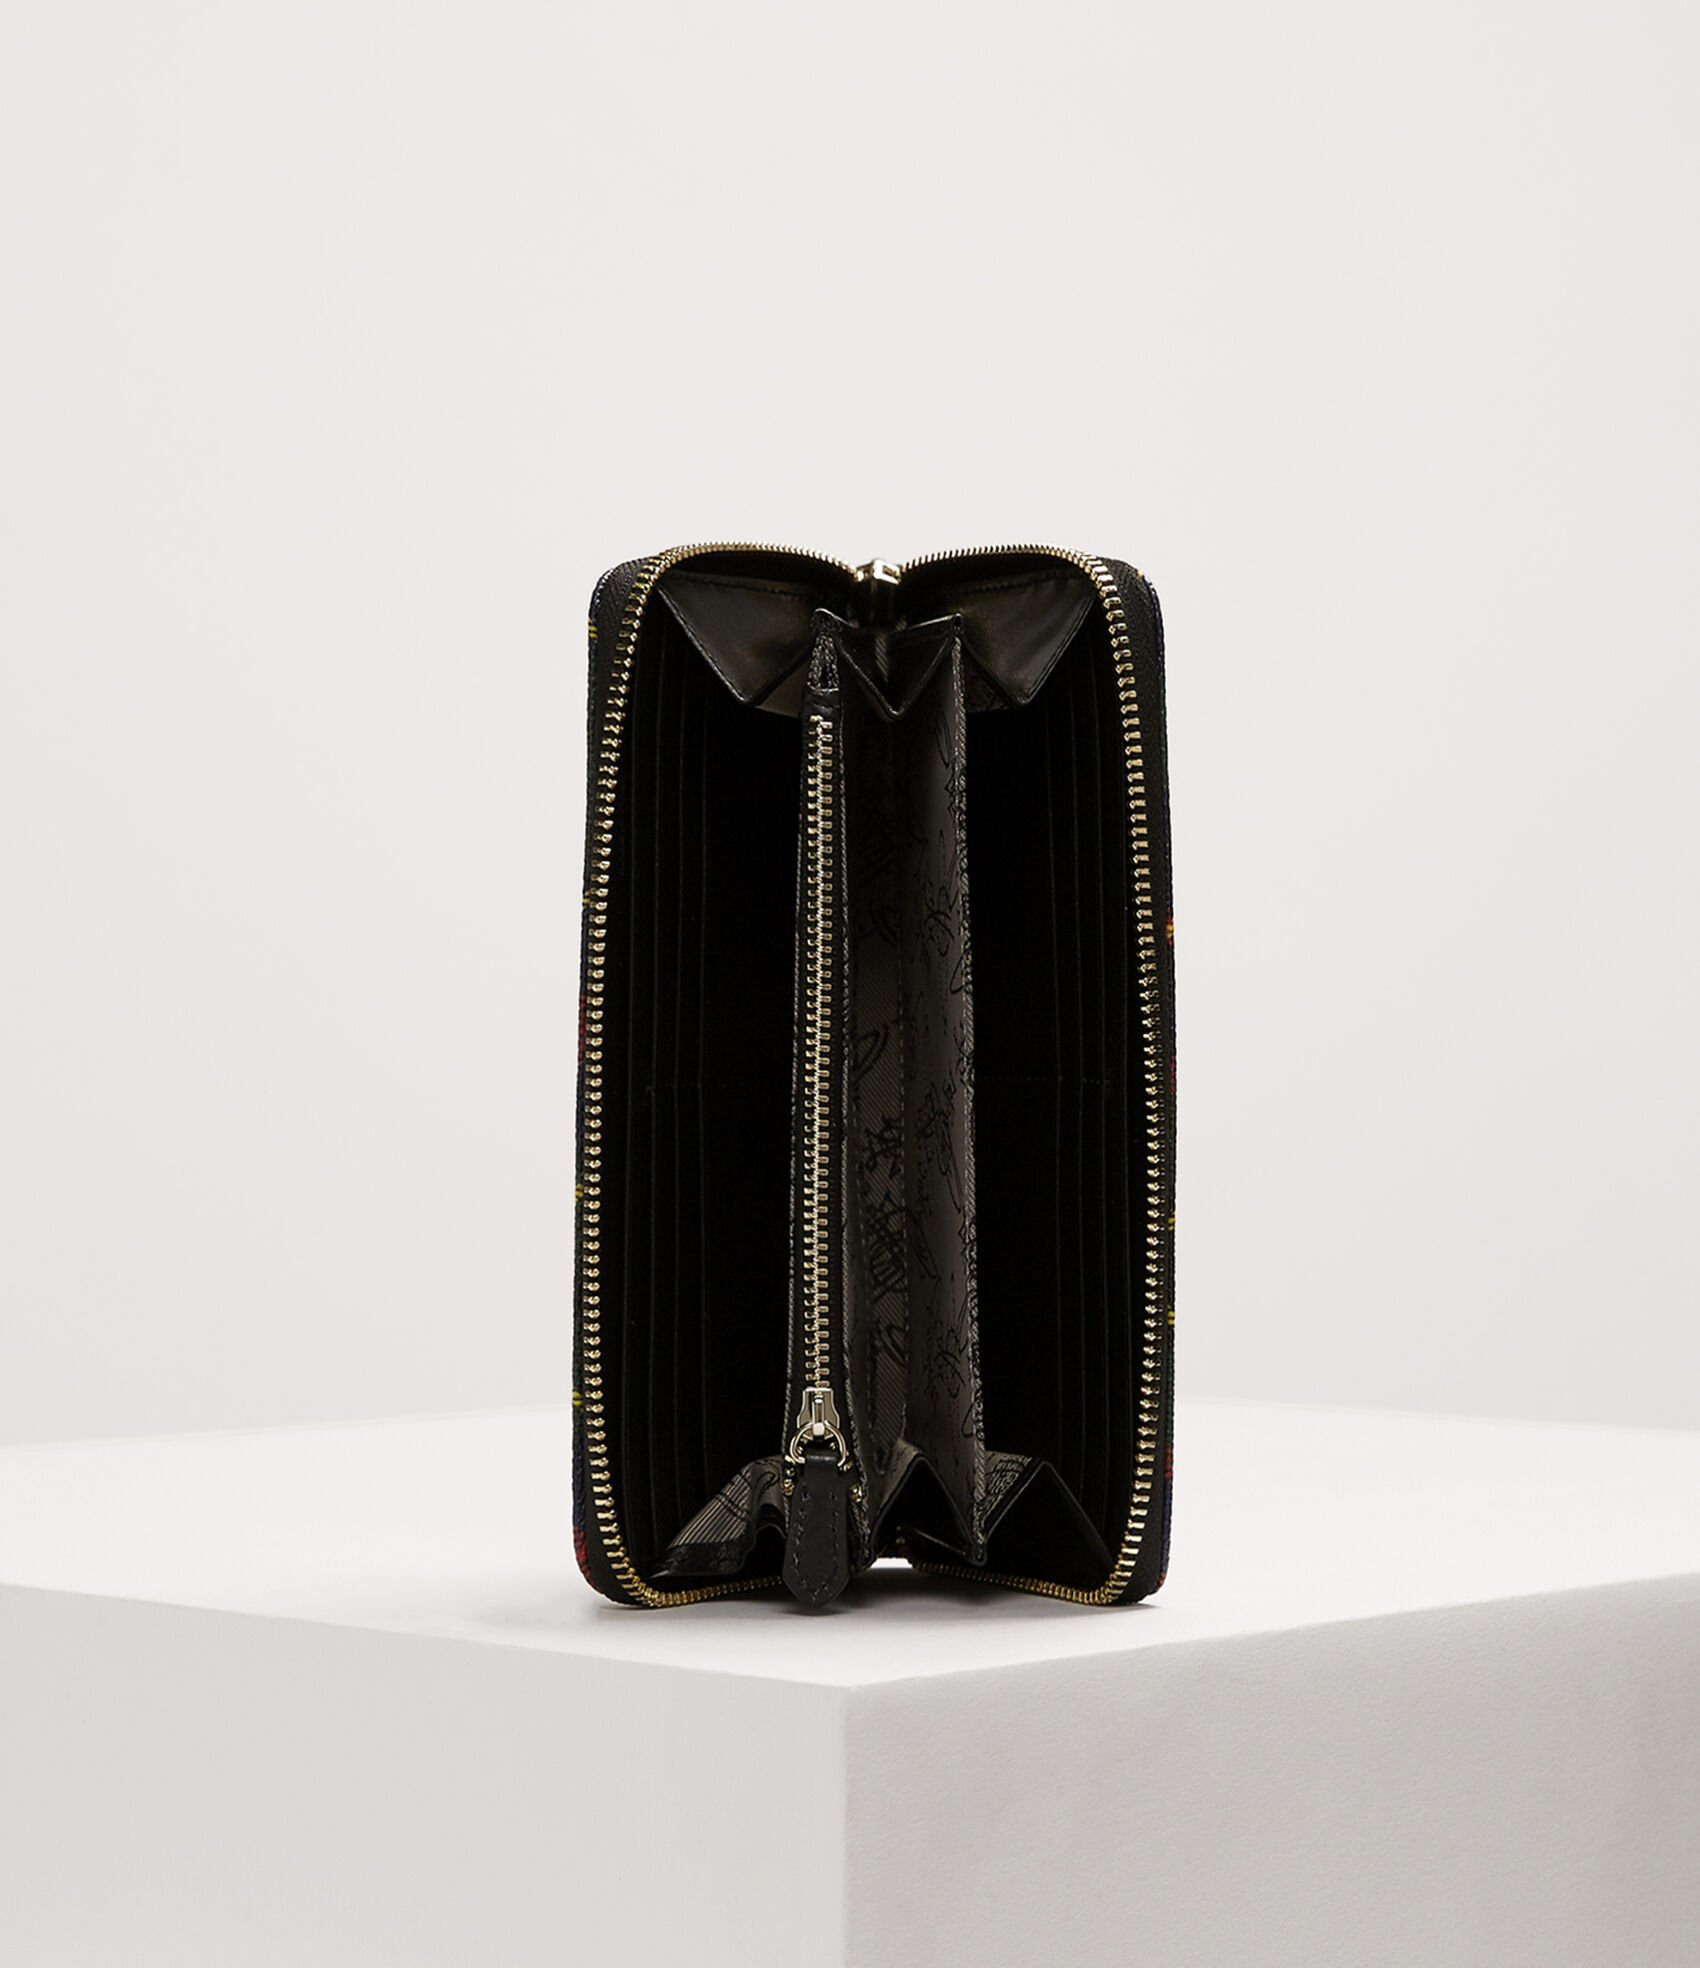 d2e98336252 Vivienne Westwood Women's Designer Wallets and Purses   Vivienne Westwood -  Derby Classic Zip Round Wallet Hunting Tartan